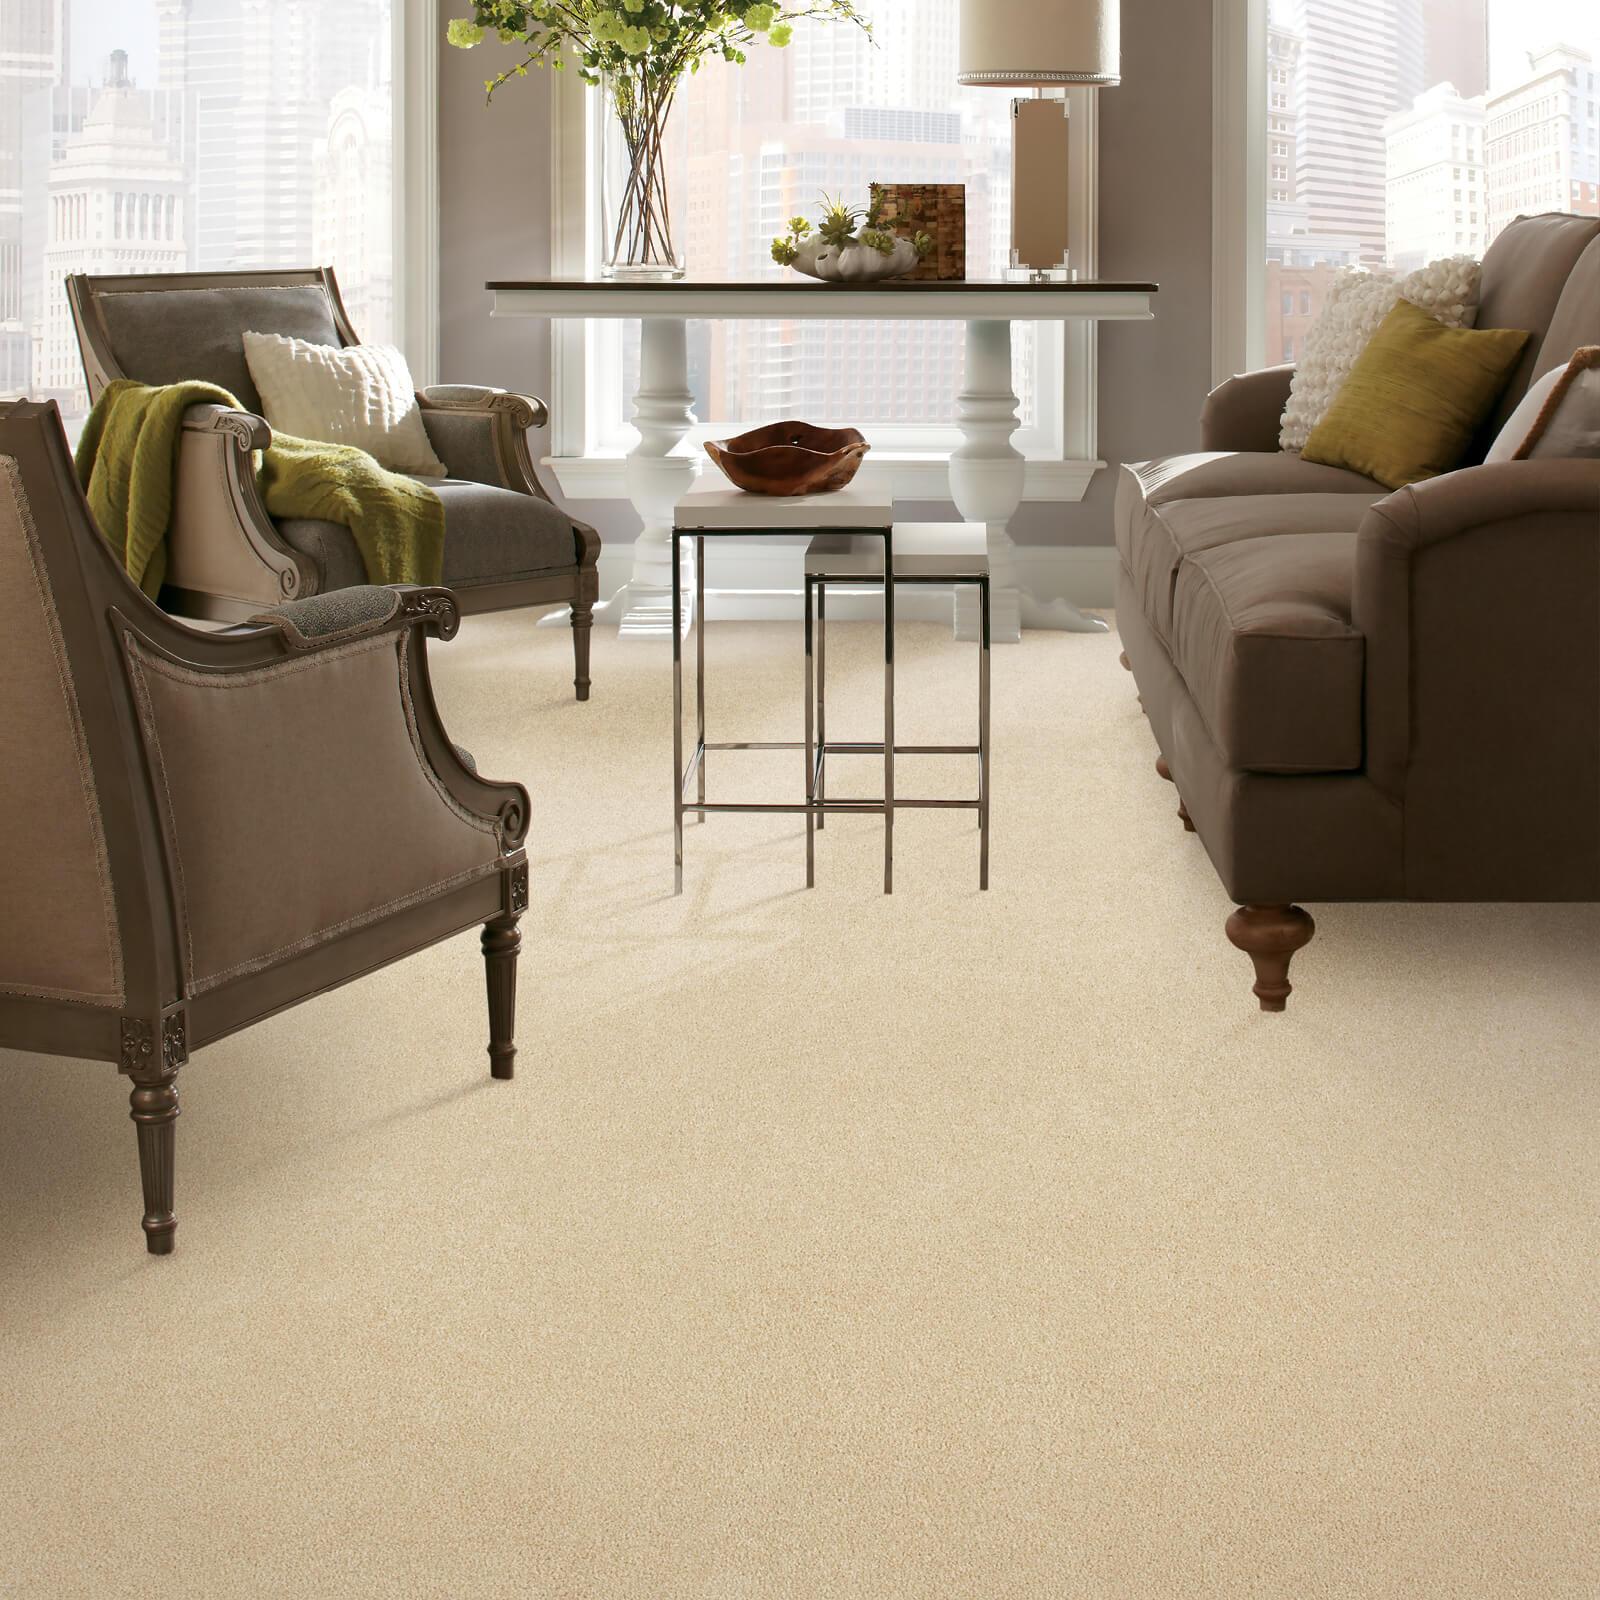 Carpet flooring | McSwain Carpet & Floors